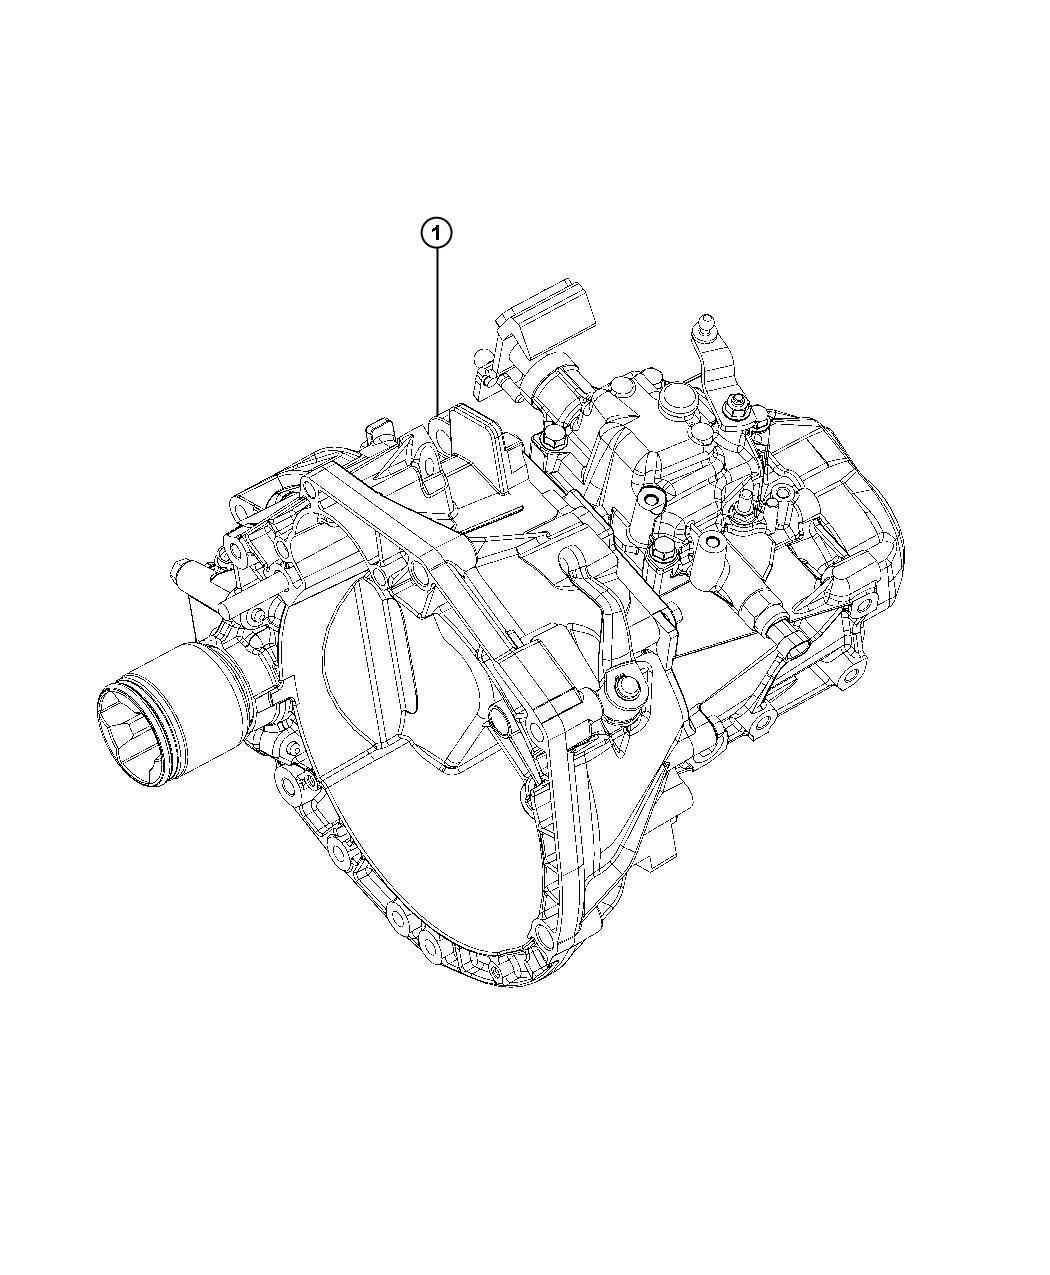 Fiat 500 Transmission. 5 speed. [3.73 rear axle ratio